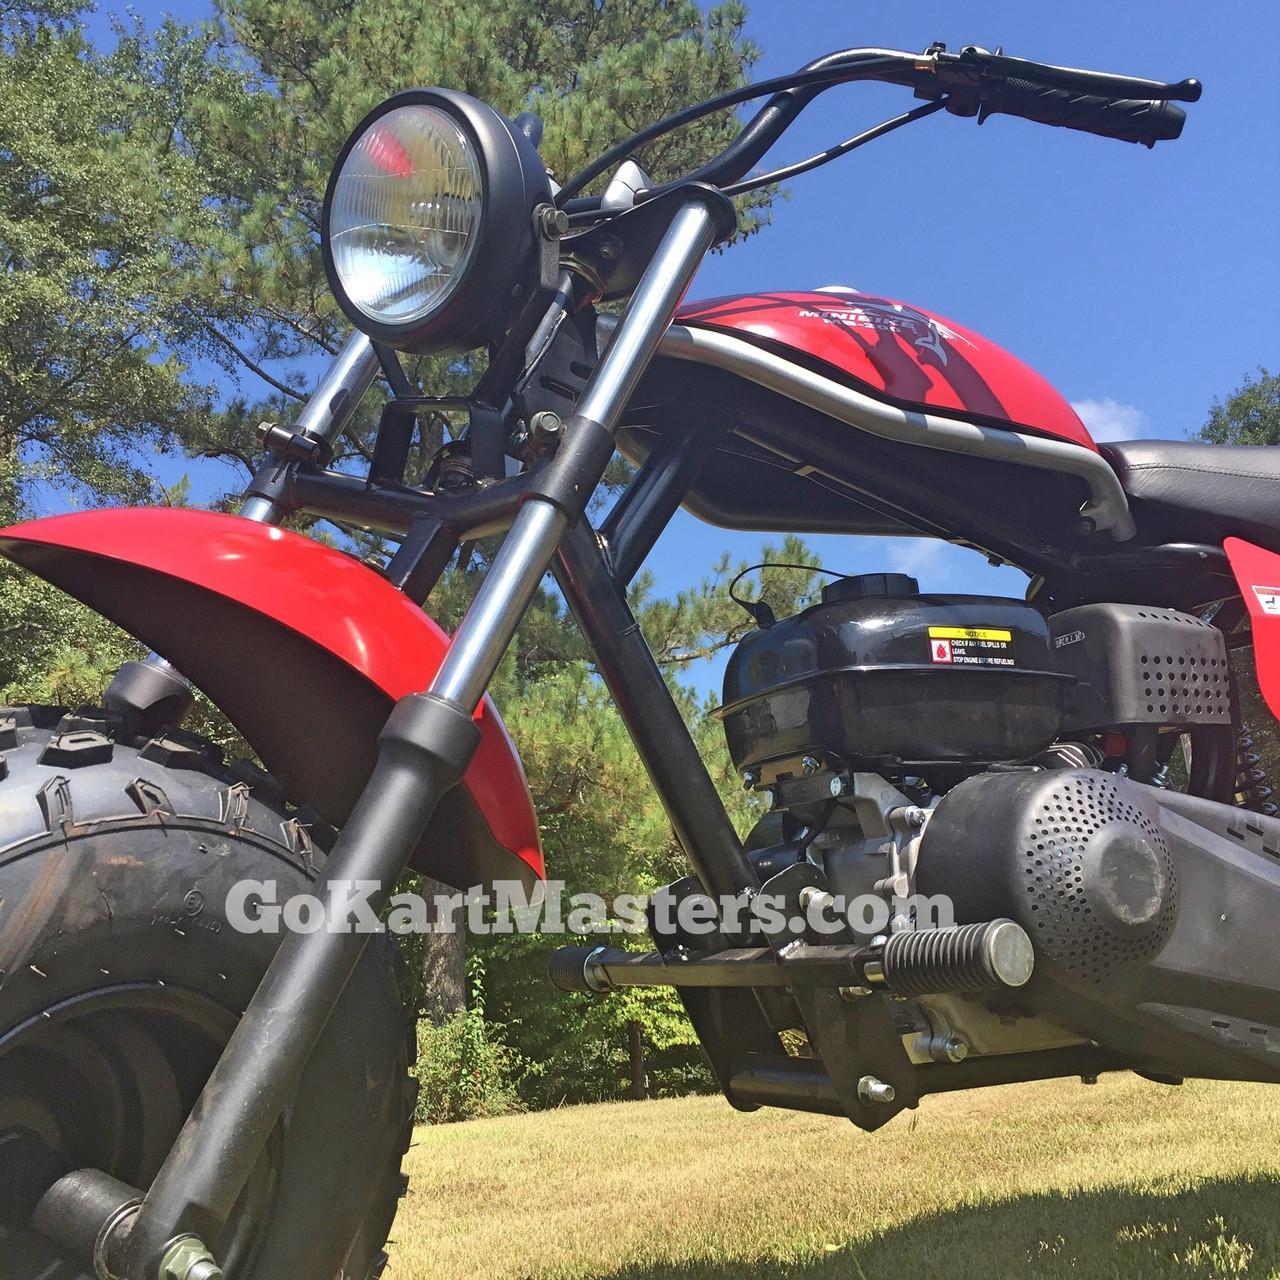 TrailMaster MB200-2 Mini Bike - 2018 Model